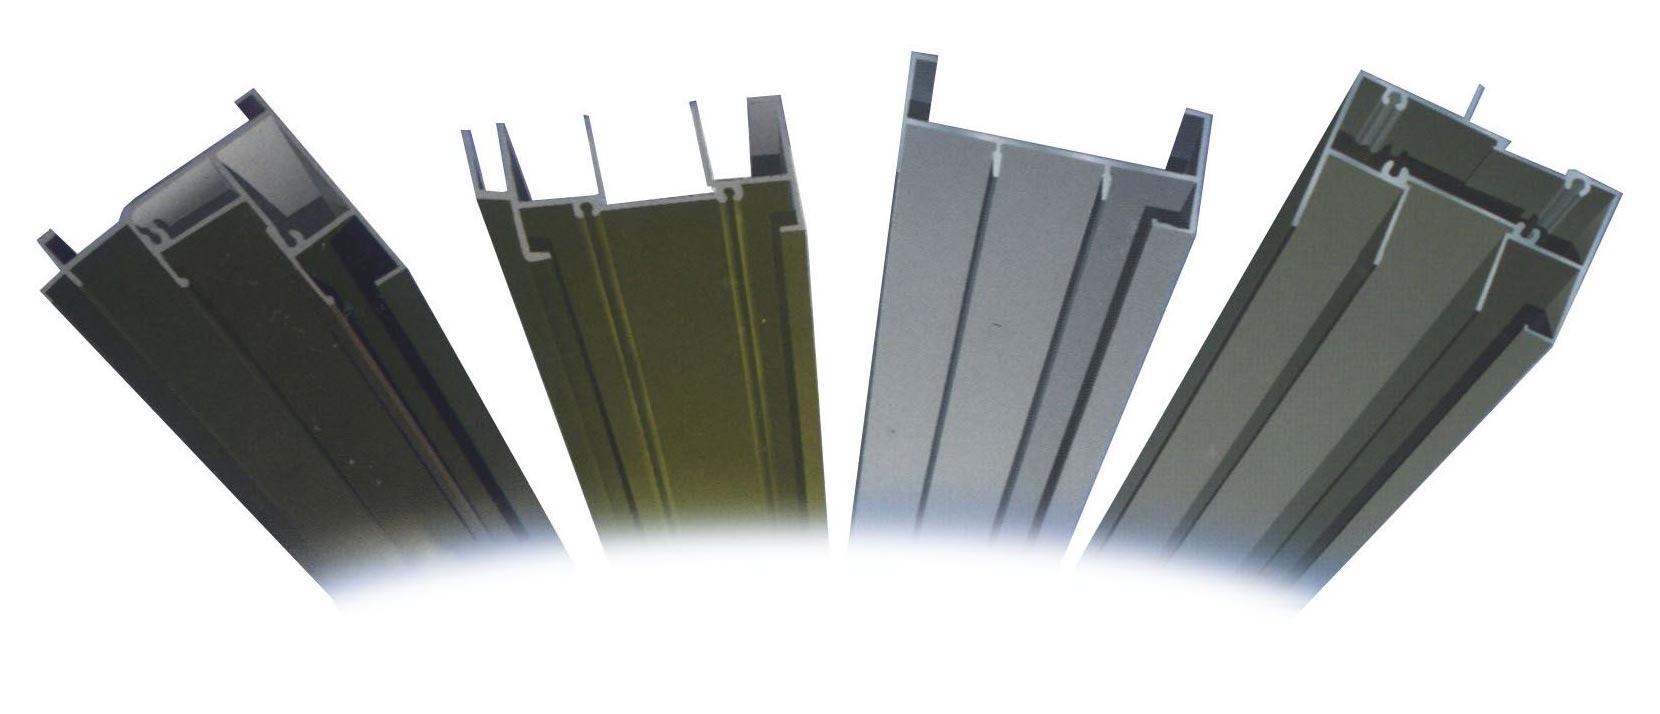 Powder Coated Aluminum Profile (Powder coated aluminium profil)